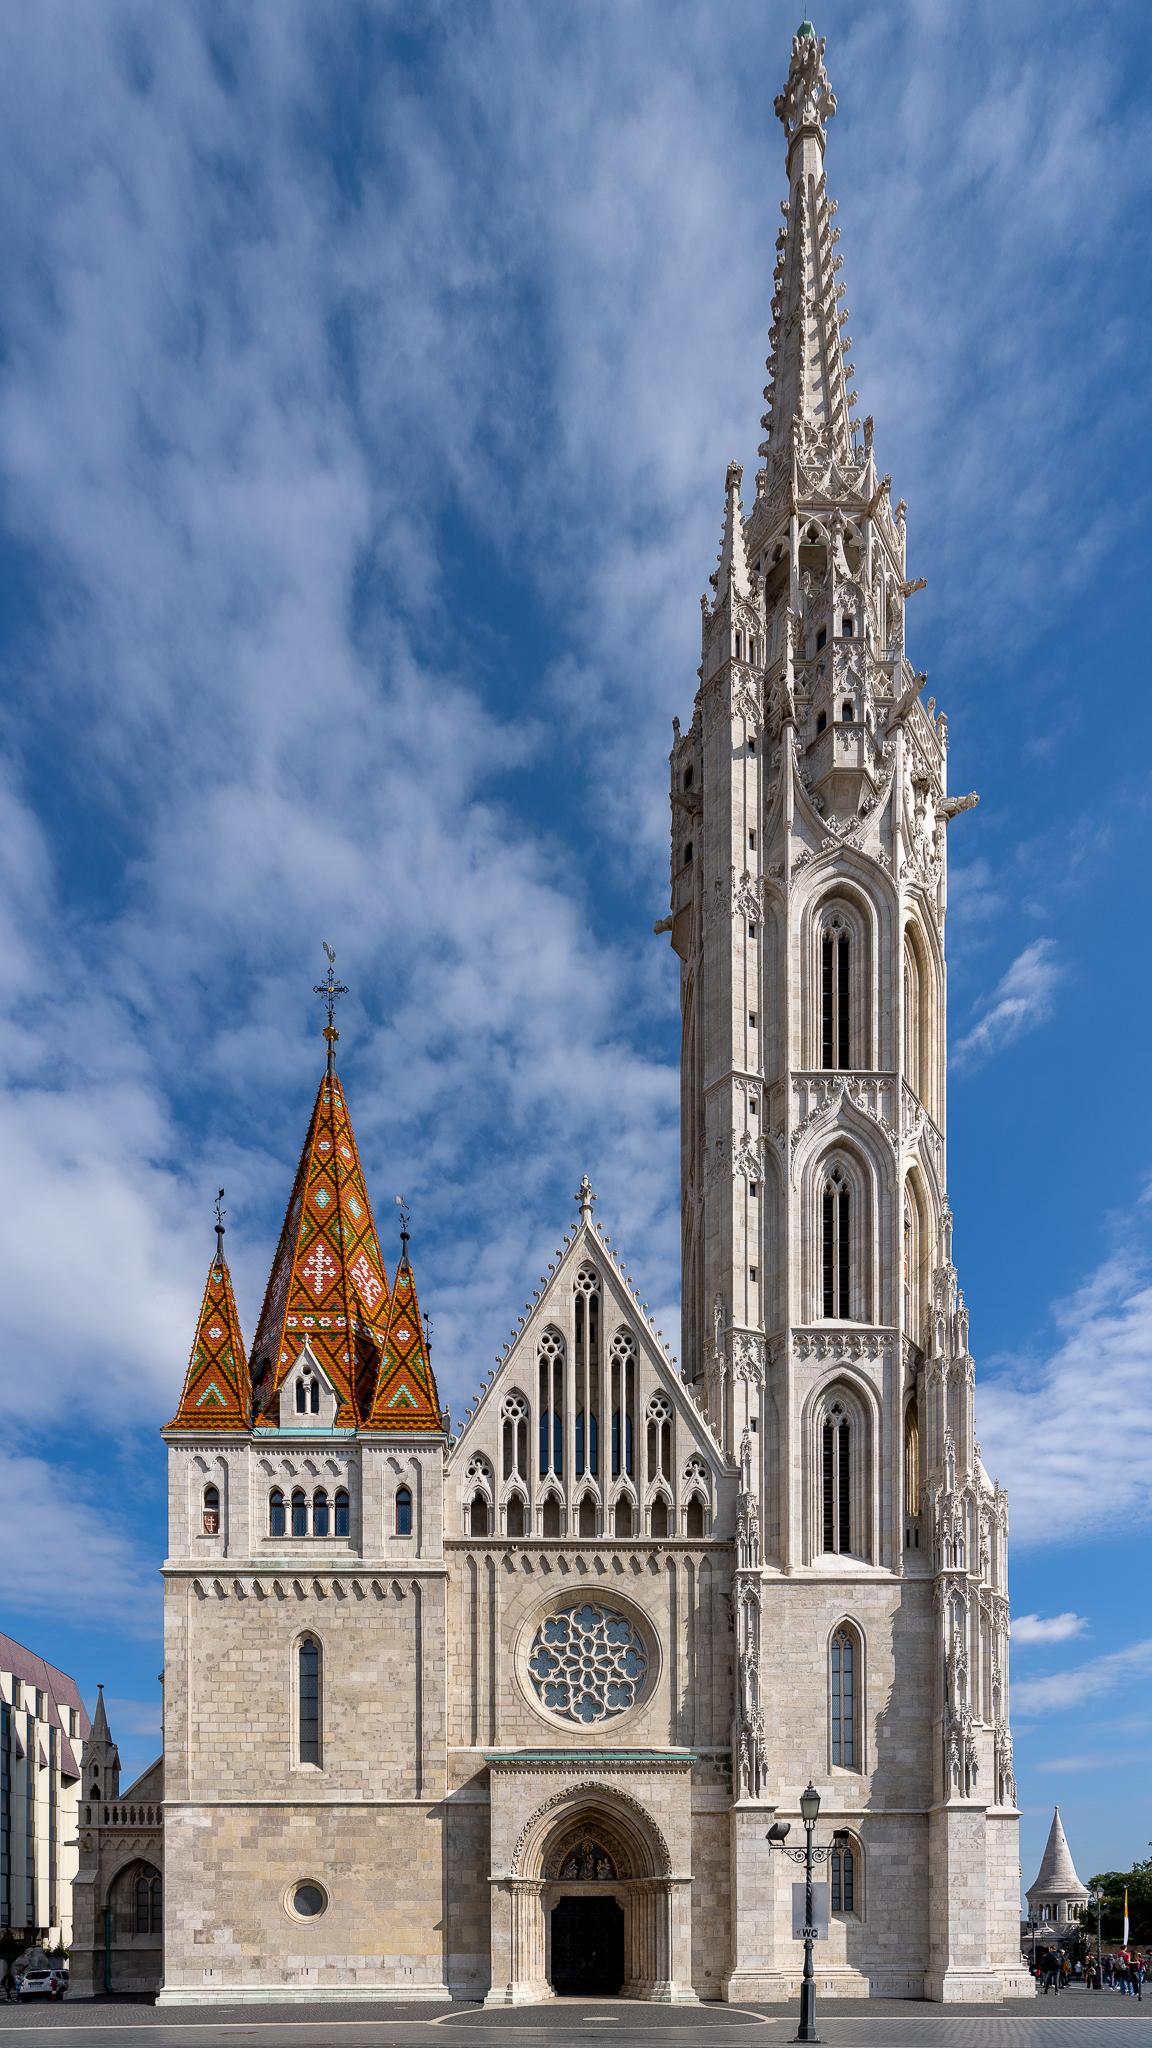 a photo of matthias church in budapest